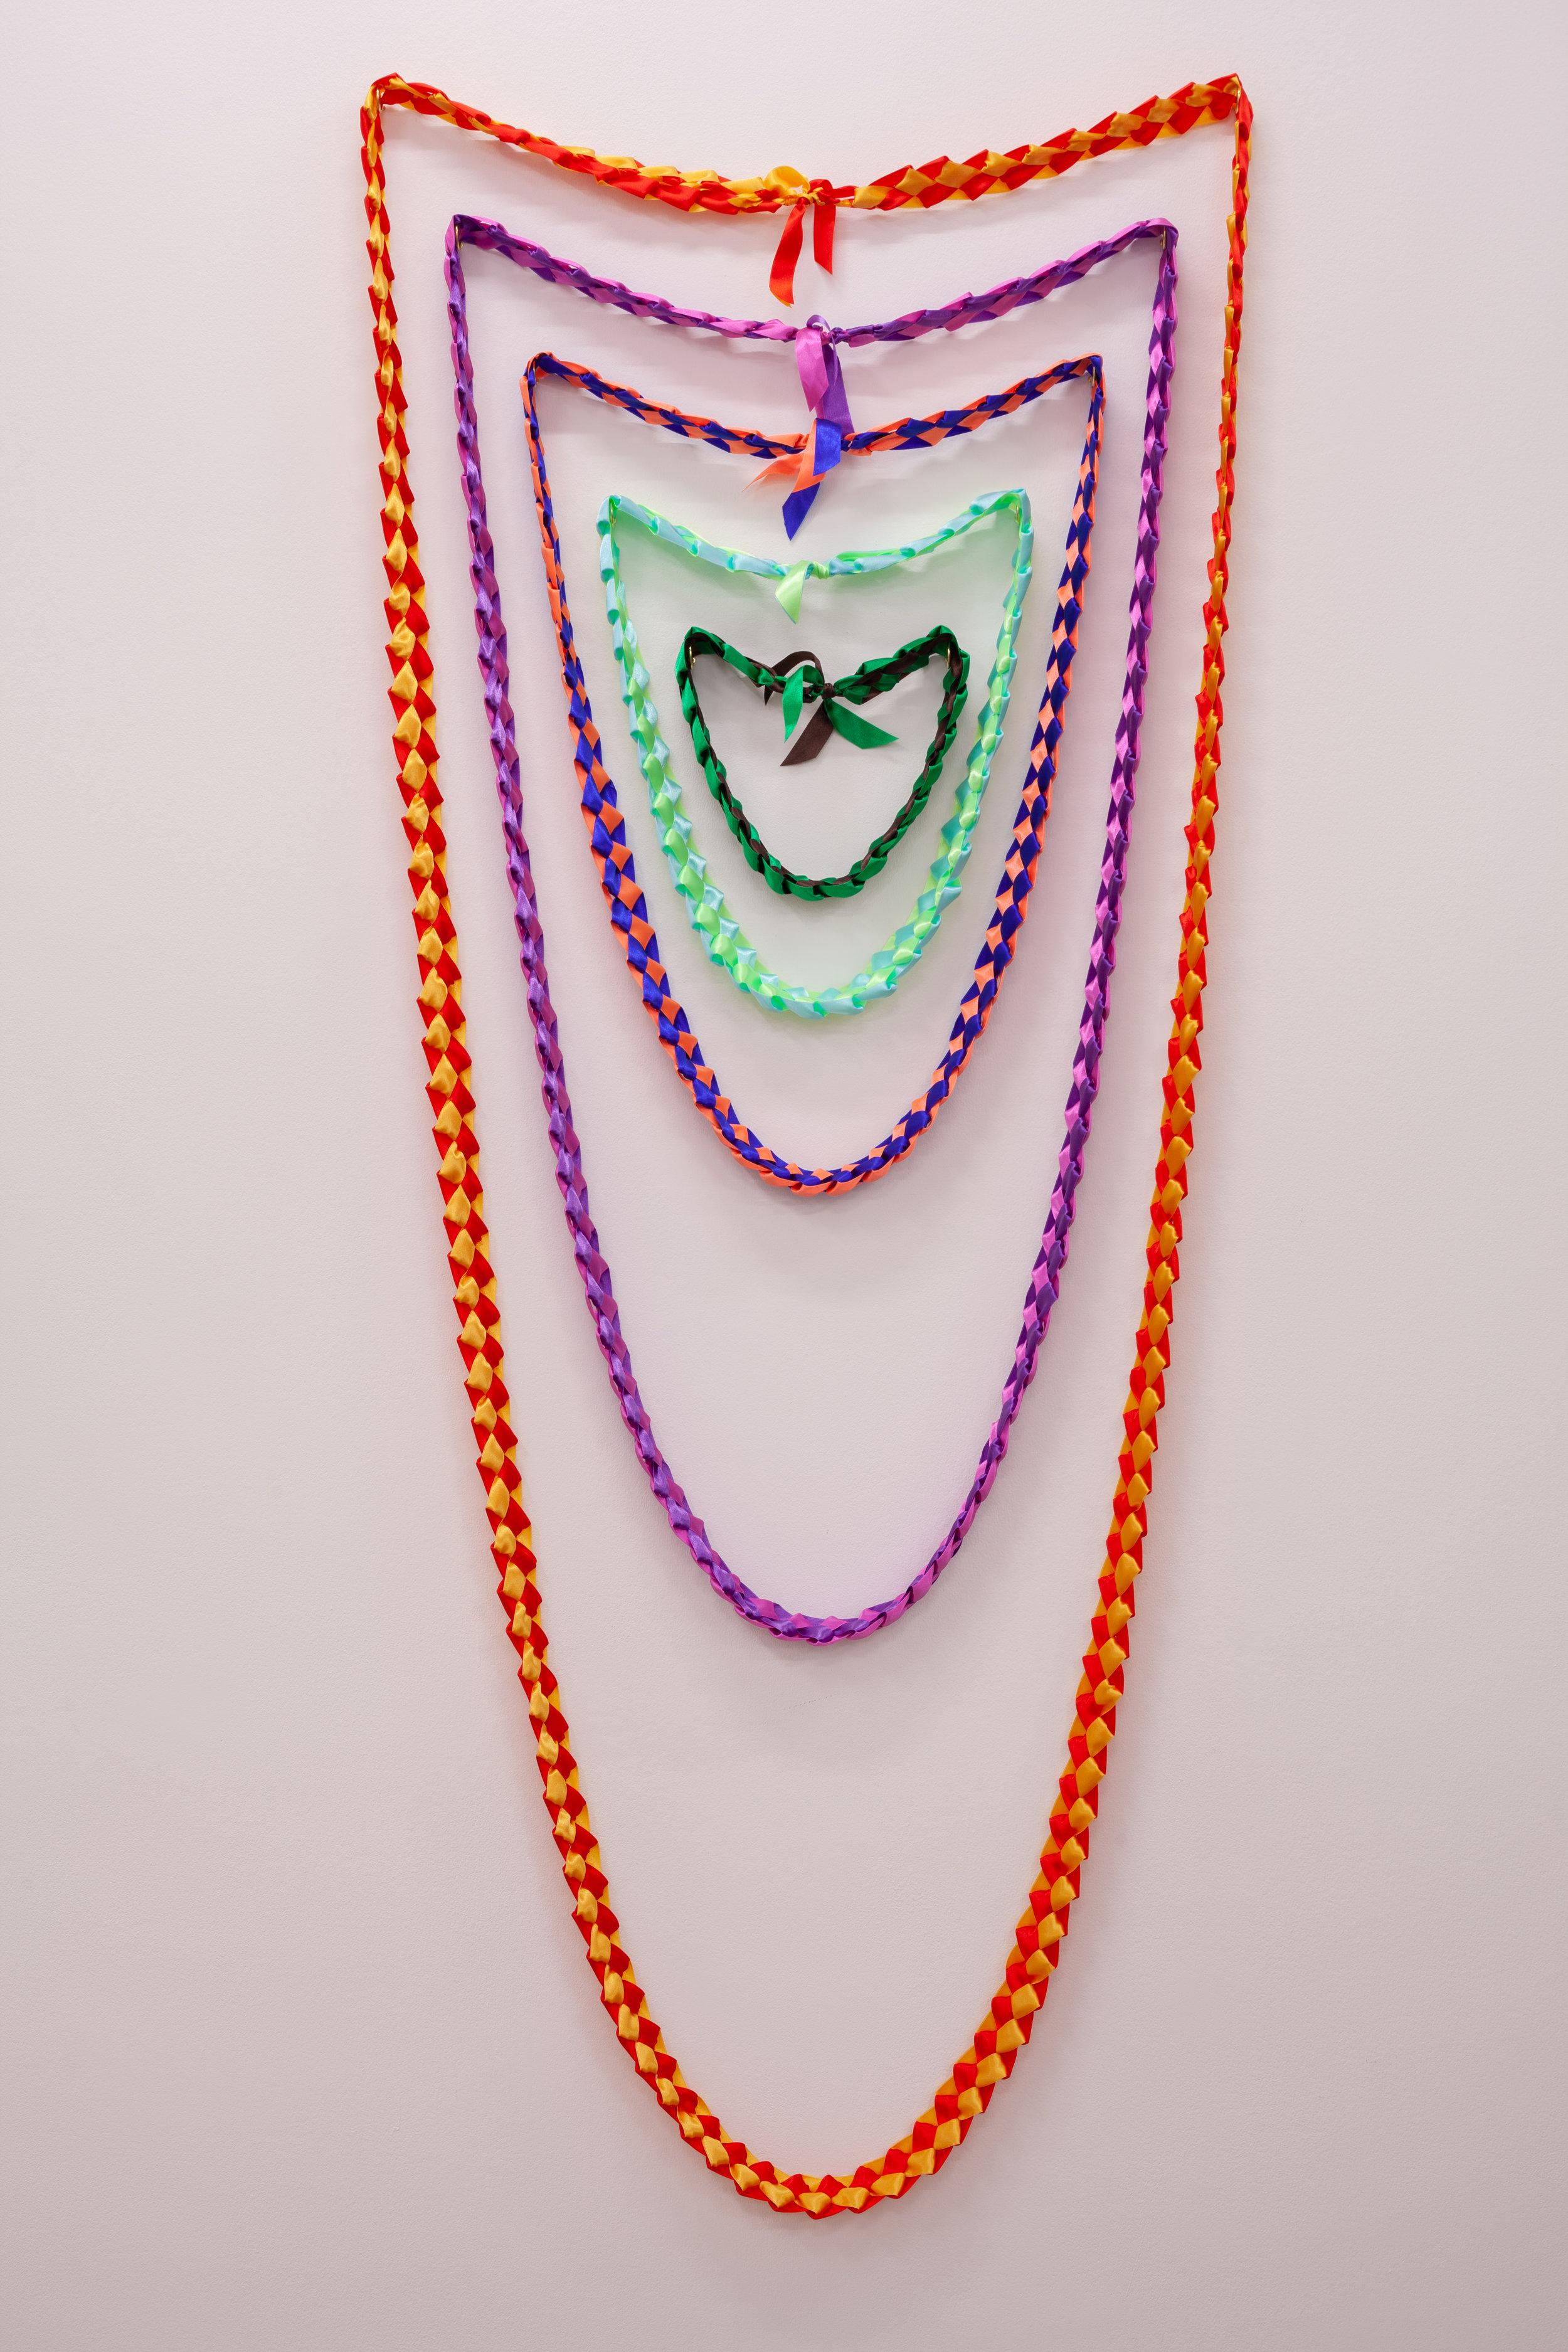 Lei Aloha , Ribbon, 90cm x 195cm, 2019 Image: ©2018 Crystal Te Moananui Squares